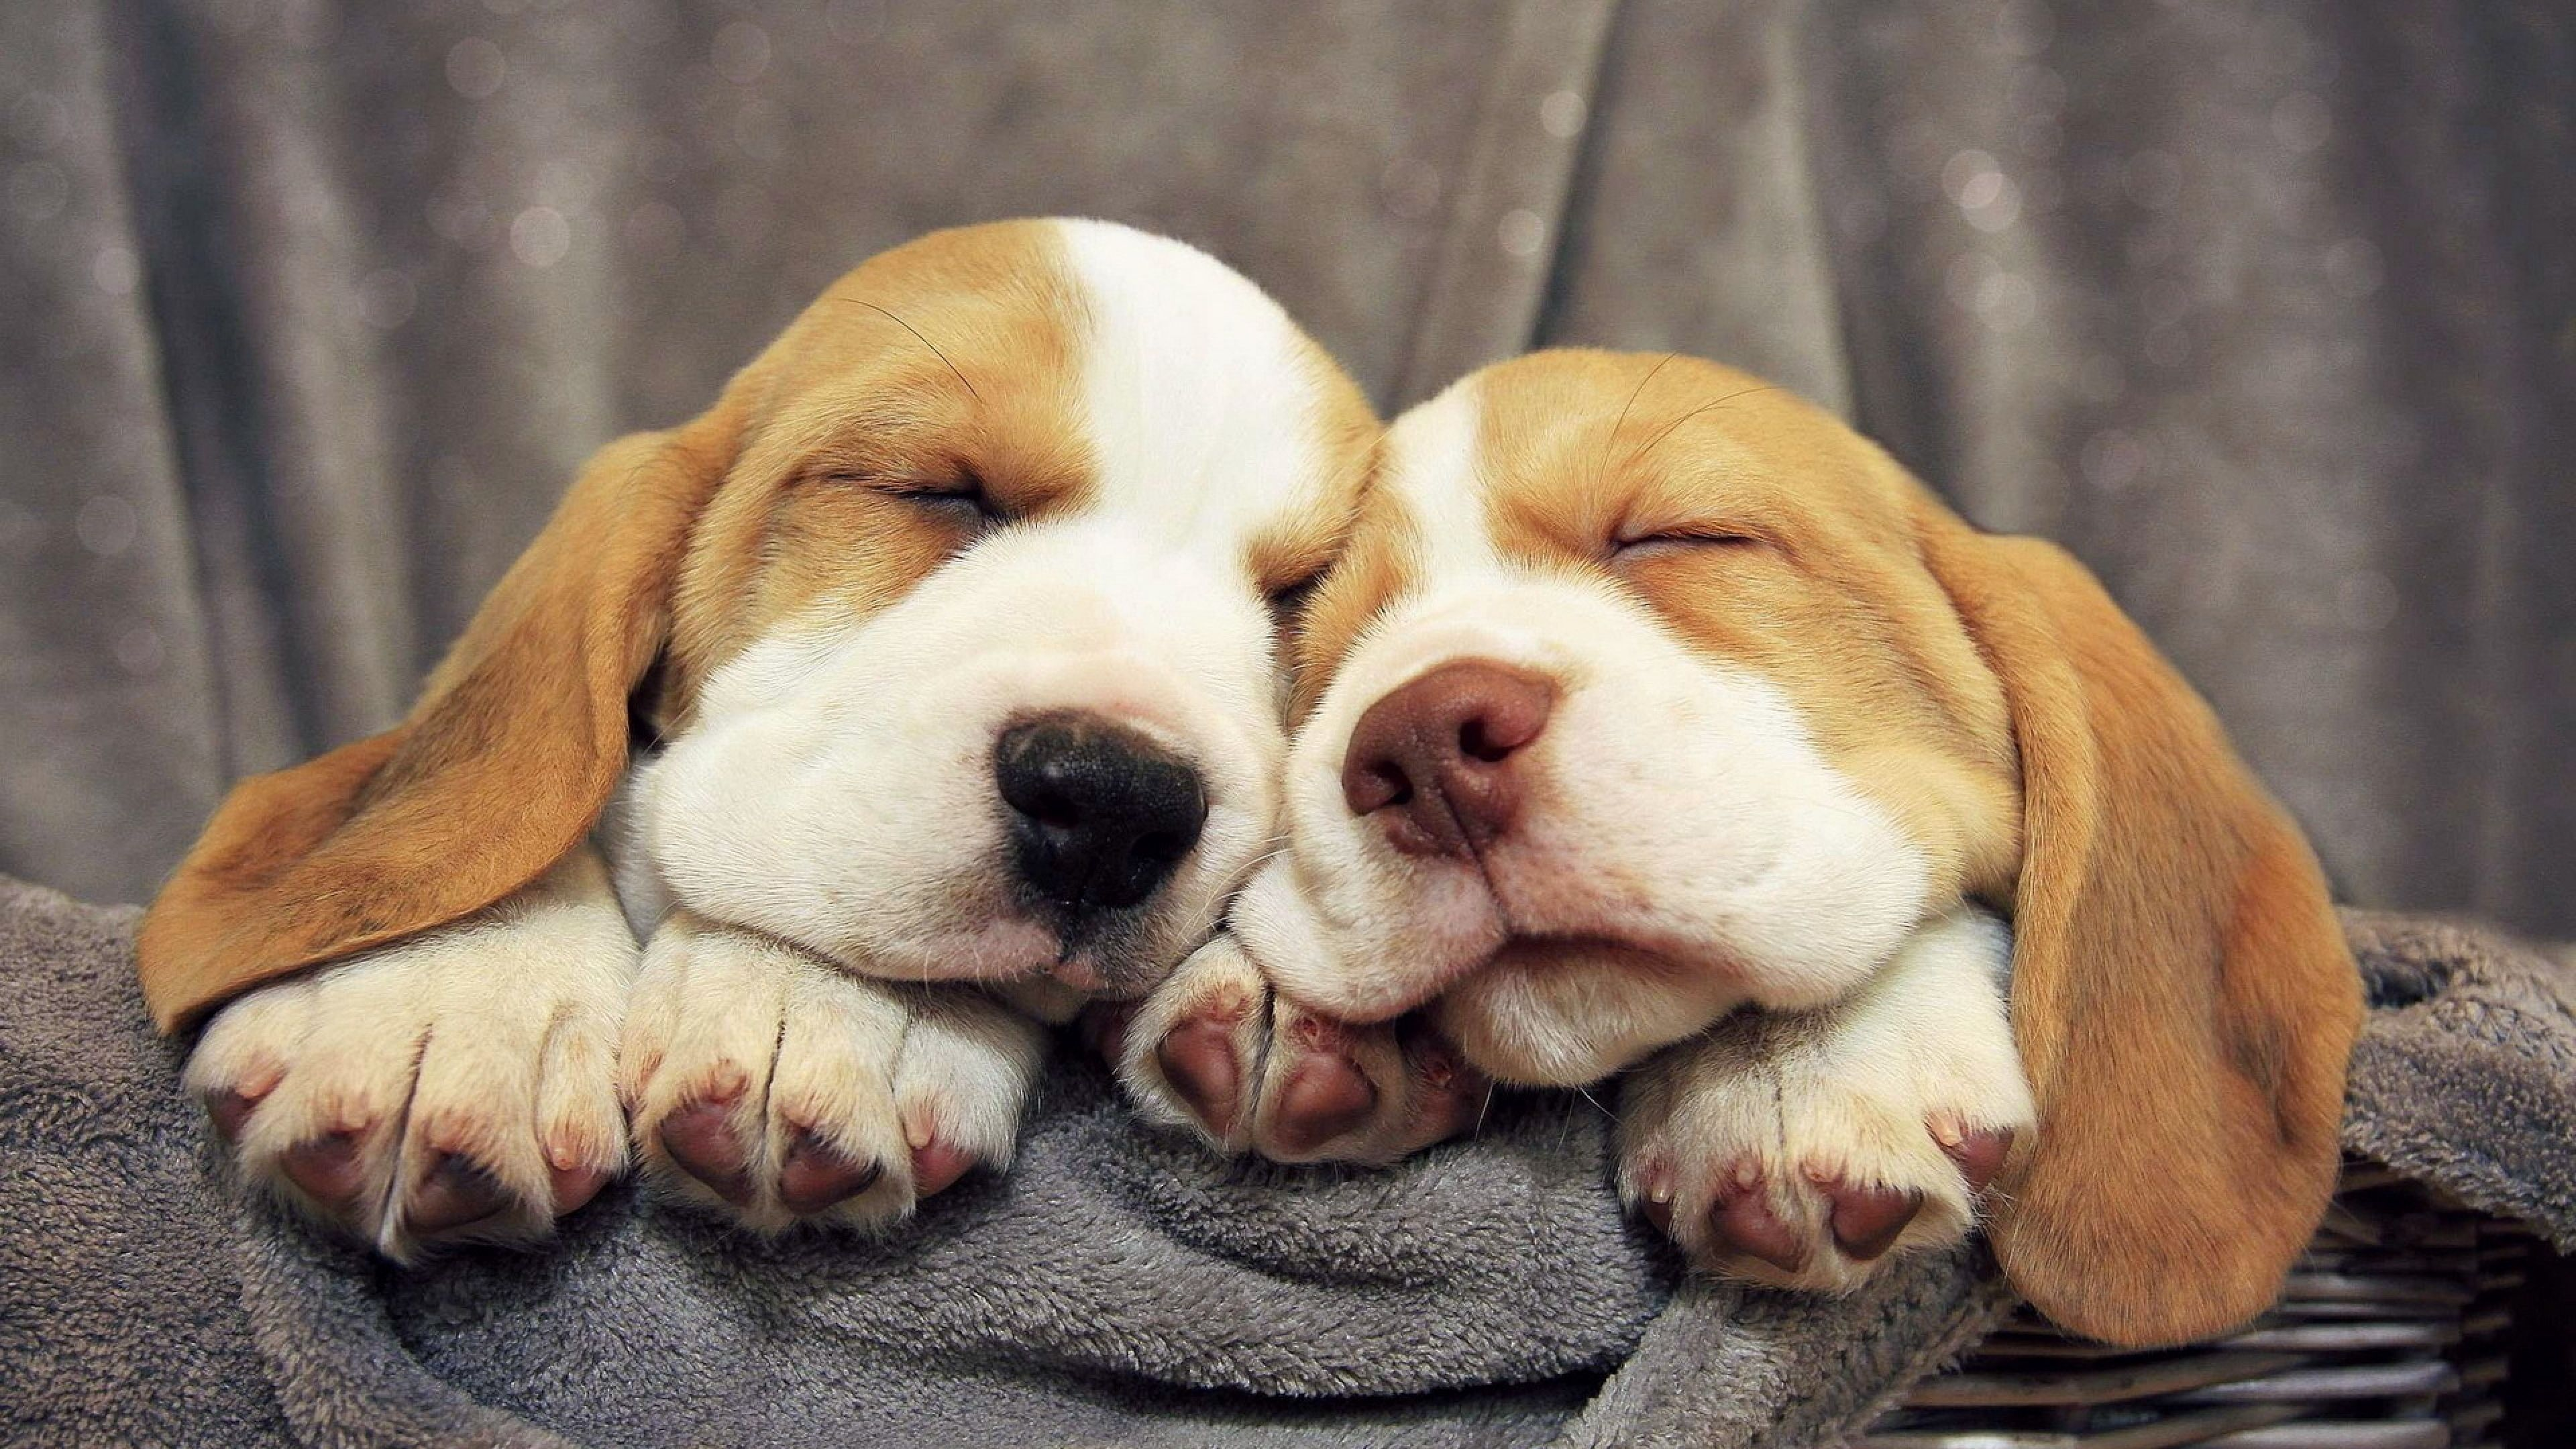 wallpaper: Beagles, Puppies, Dogs wallpaper